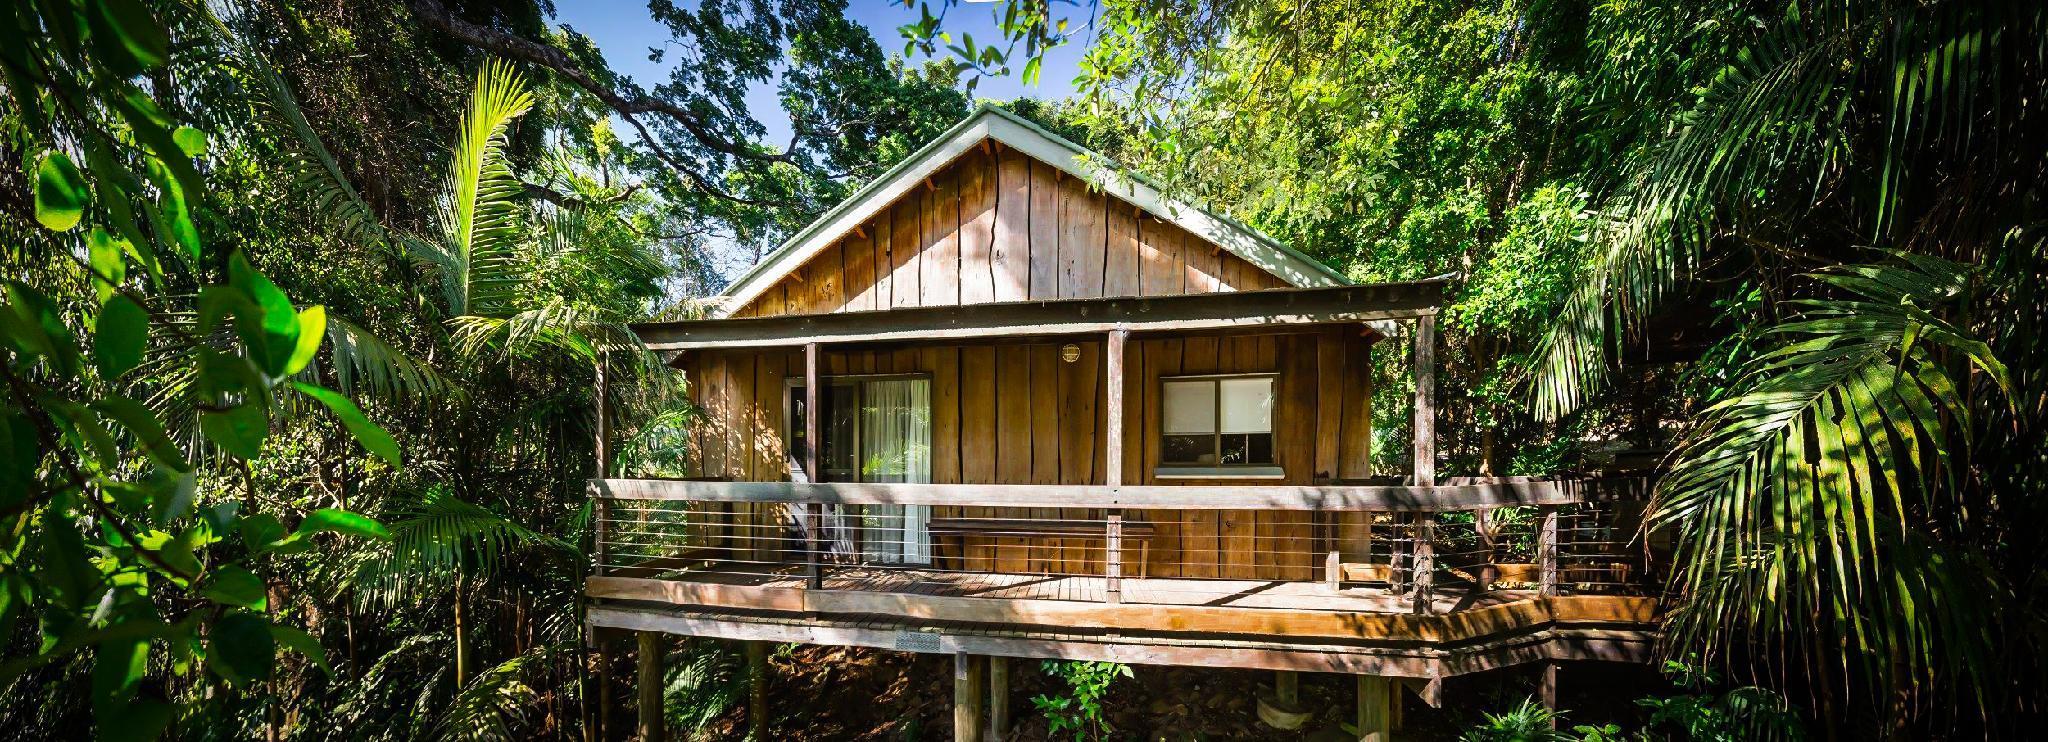 Mt Glorious Getaways Cottages